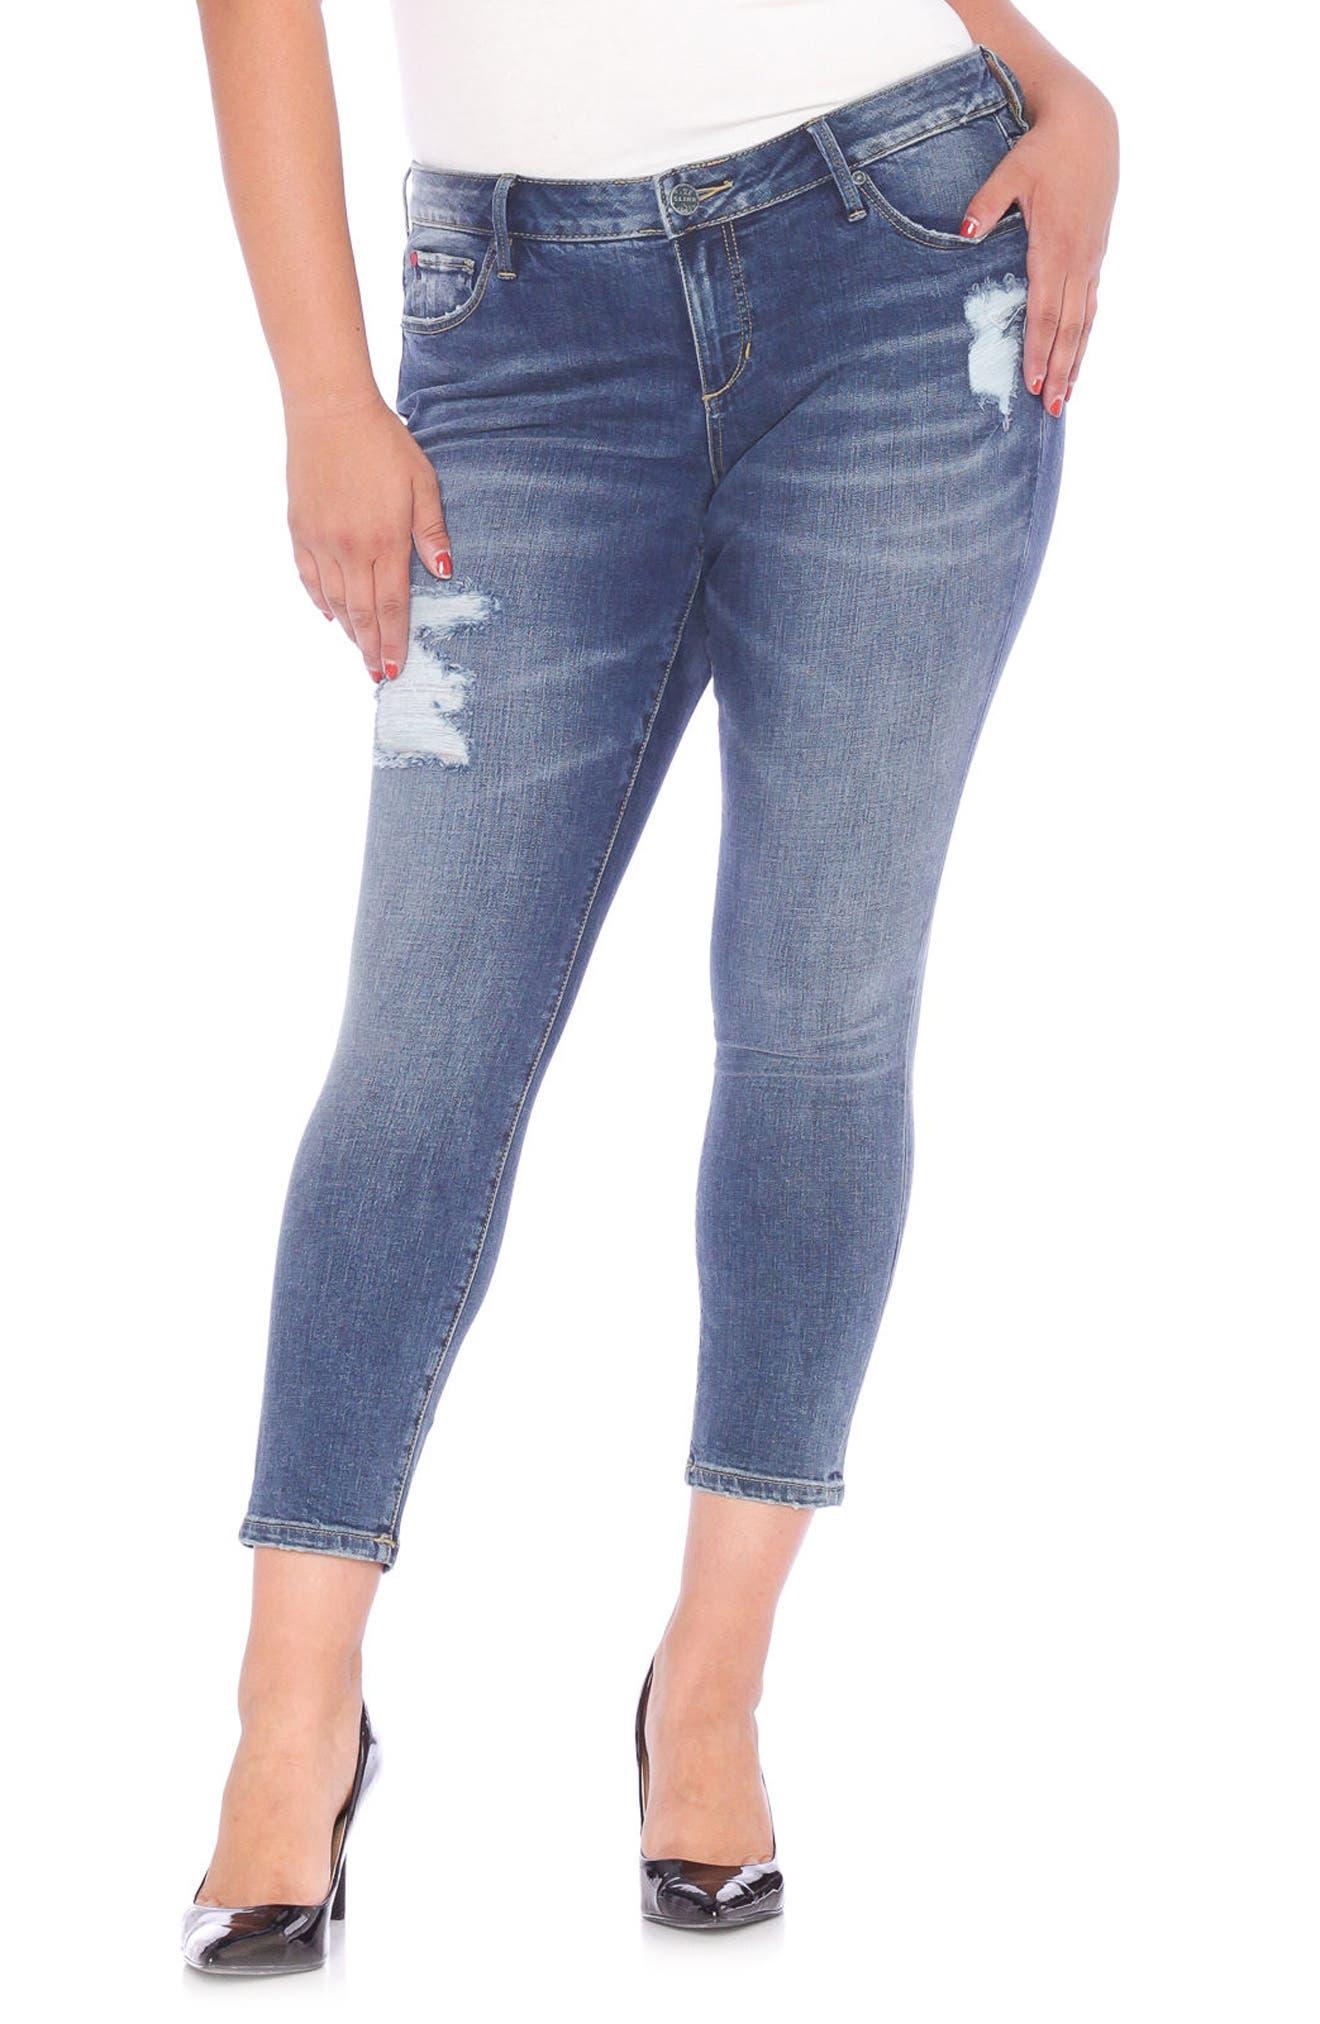 SLINK Jeans Distressed Ankle Skinny Jeans (Annie) (Plus Size)